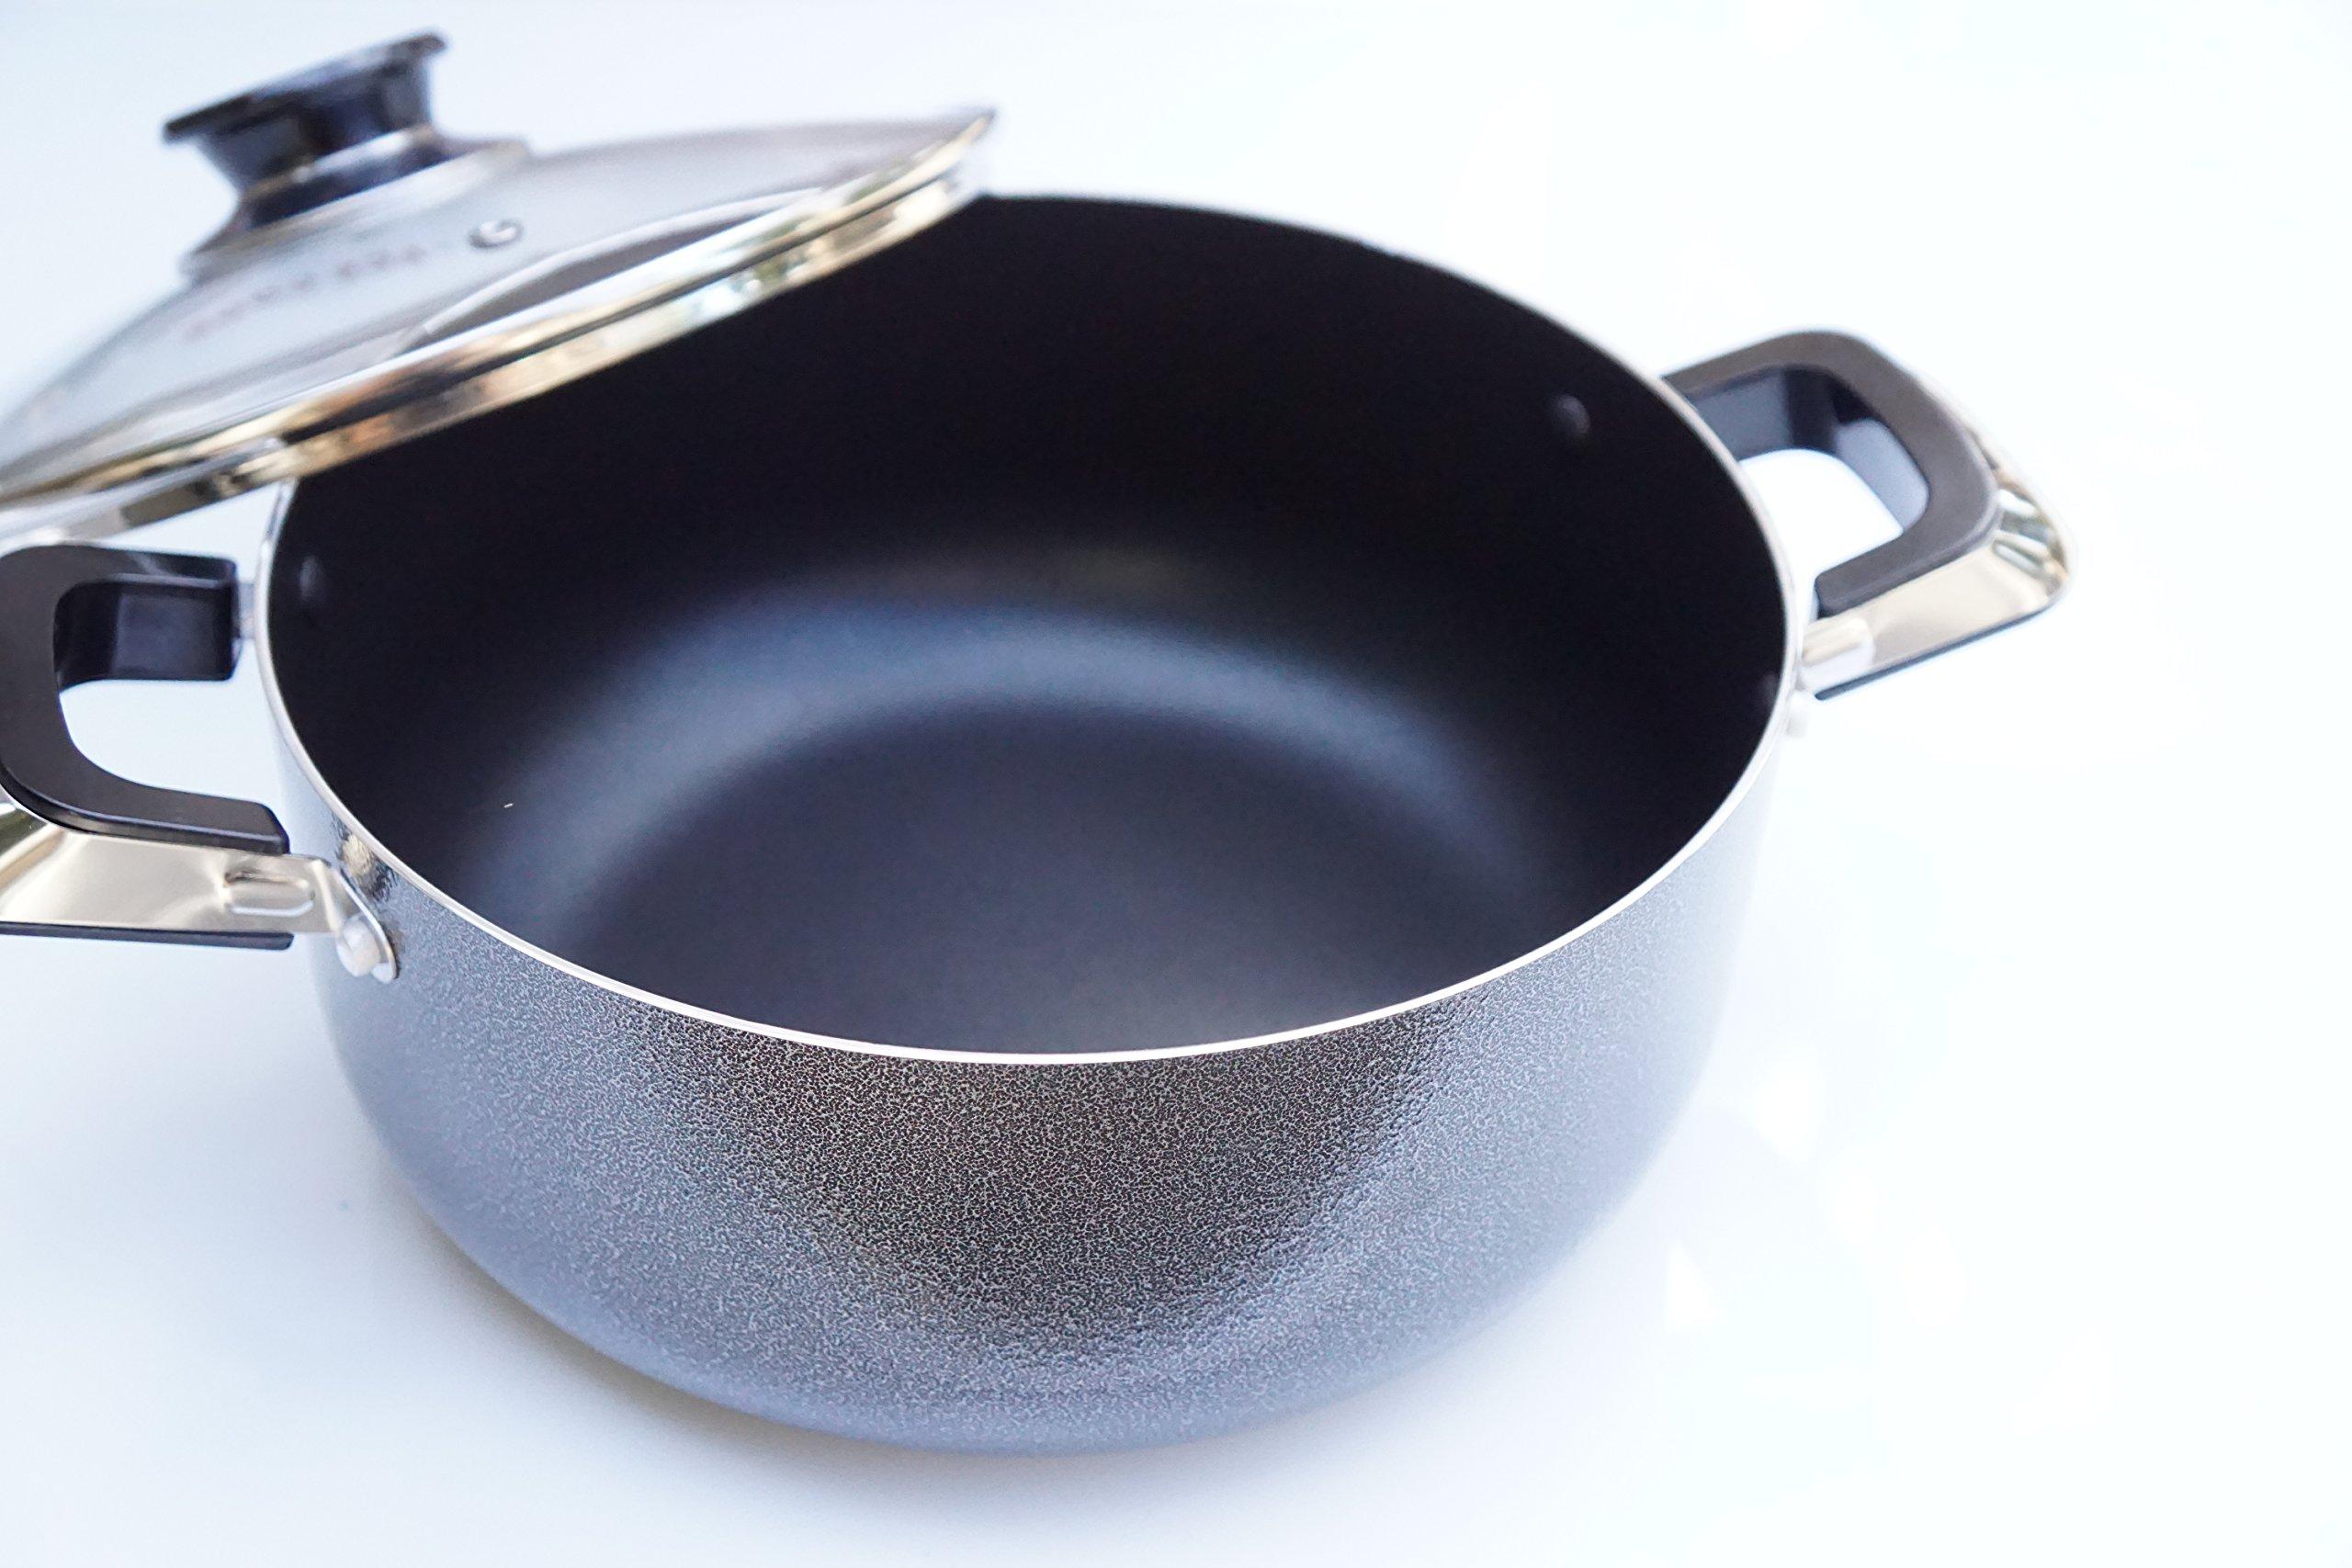 Home N Kitchenware Collection 4-Quart Aluminum Pot Stockpot w/ Glass Lid